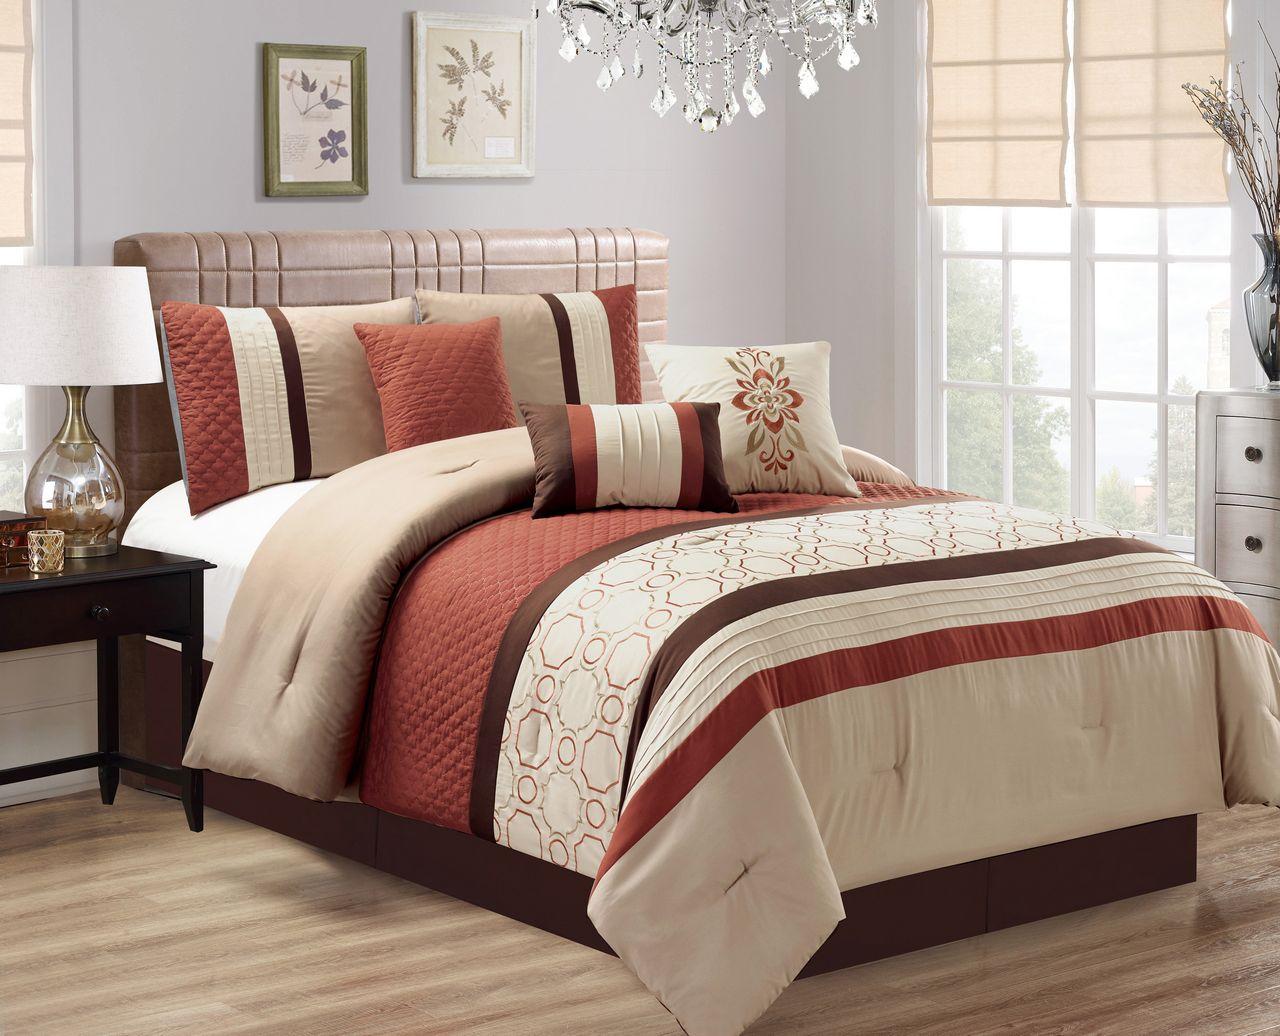 Geometric Black And Ivory Bedding